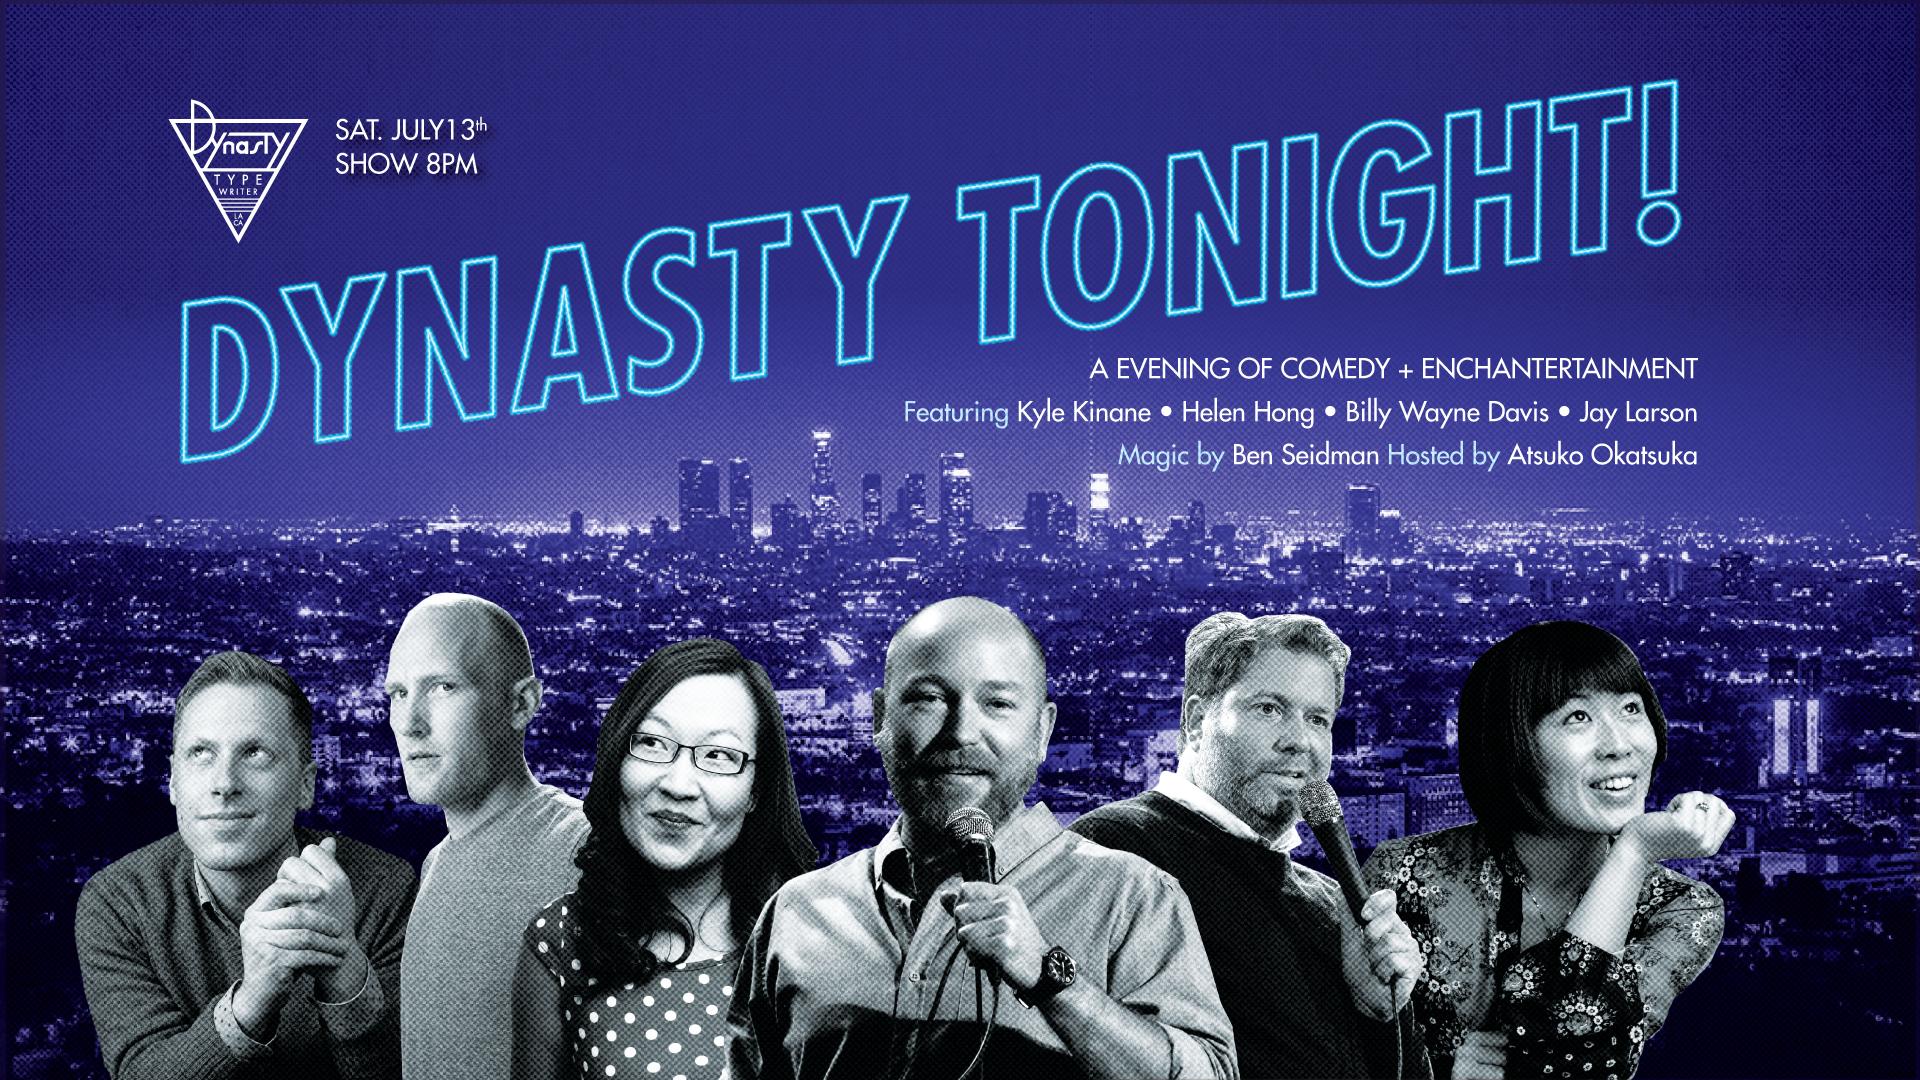 07.13-Dynasty-Tonight_bn.jpg